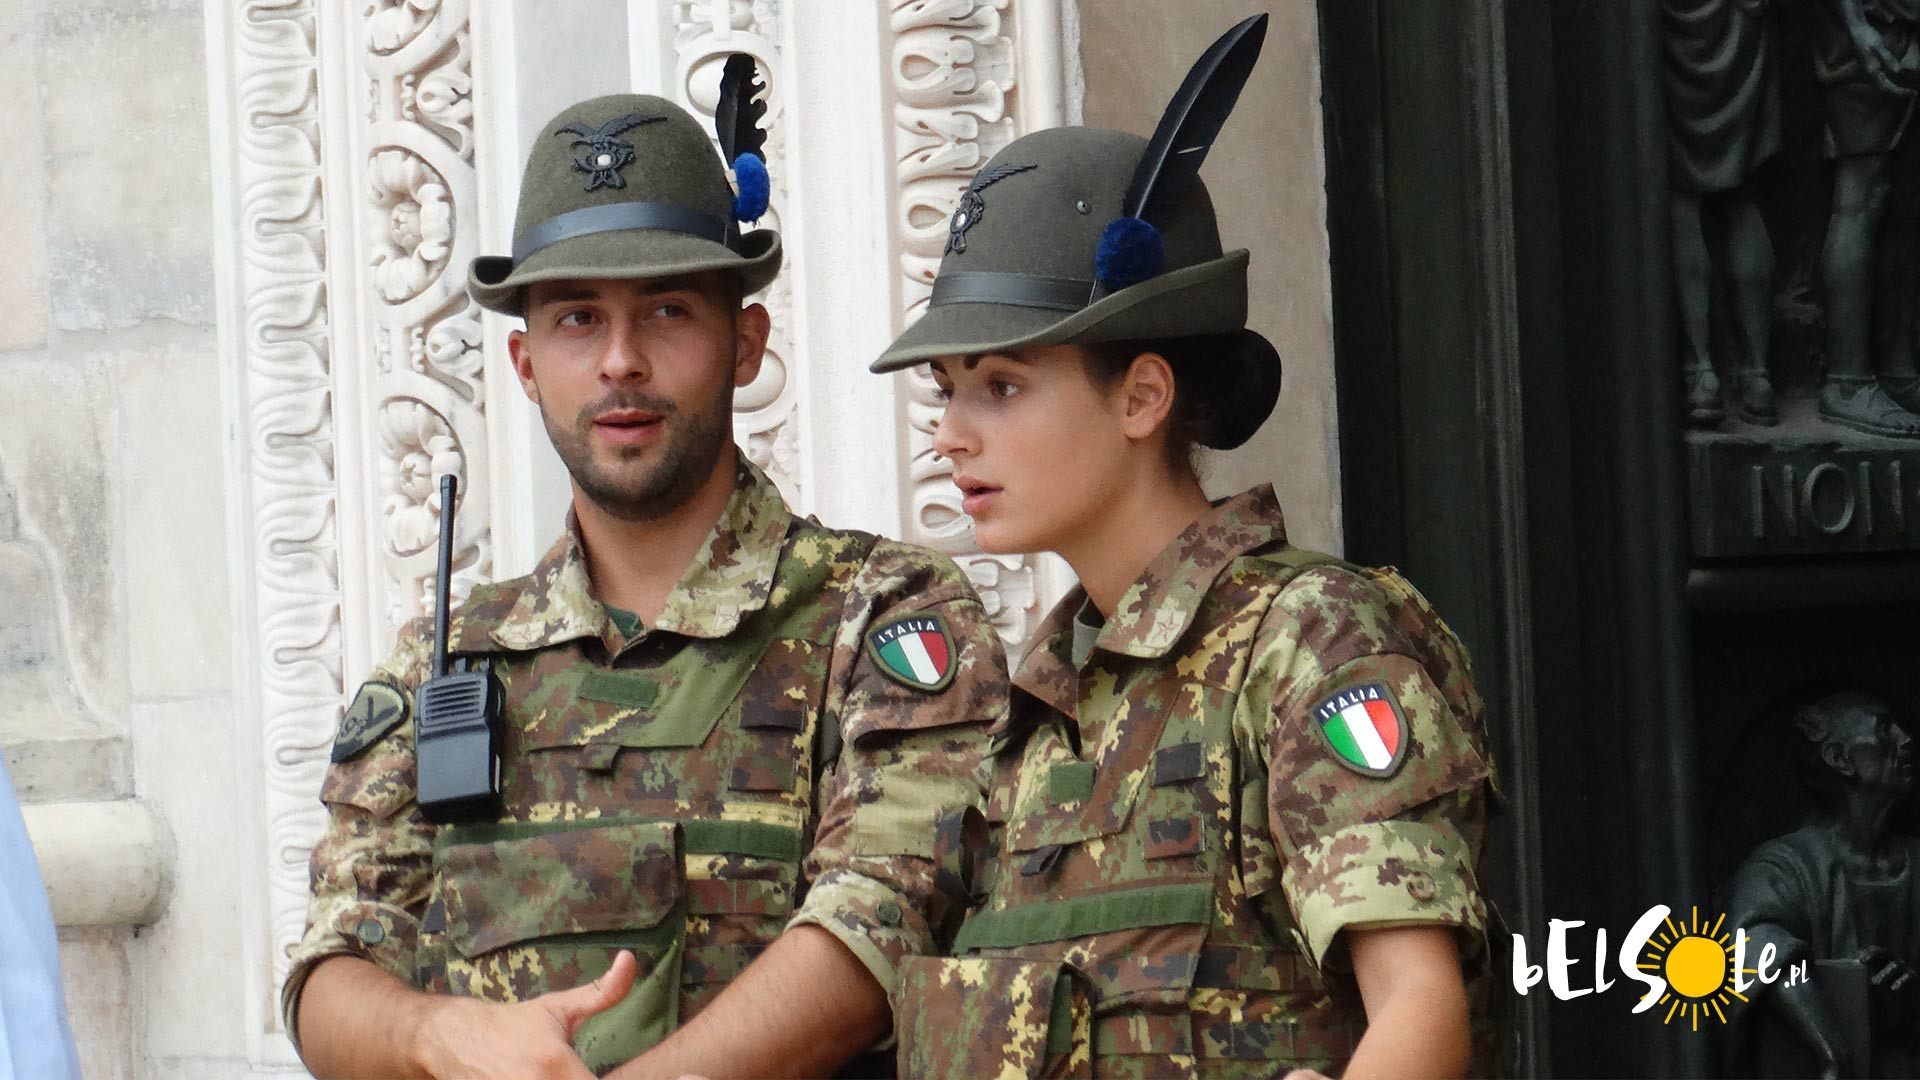 Mediolan_policja_armia_alpejska_carabinieri